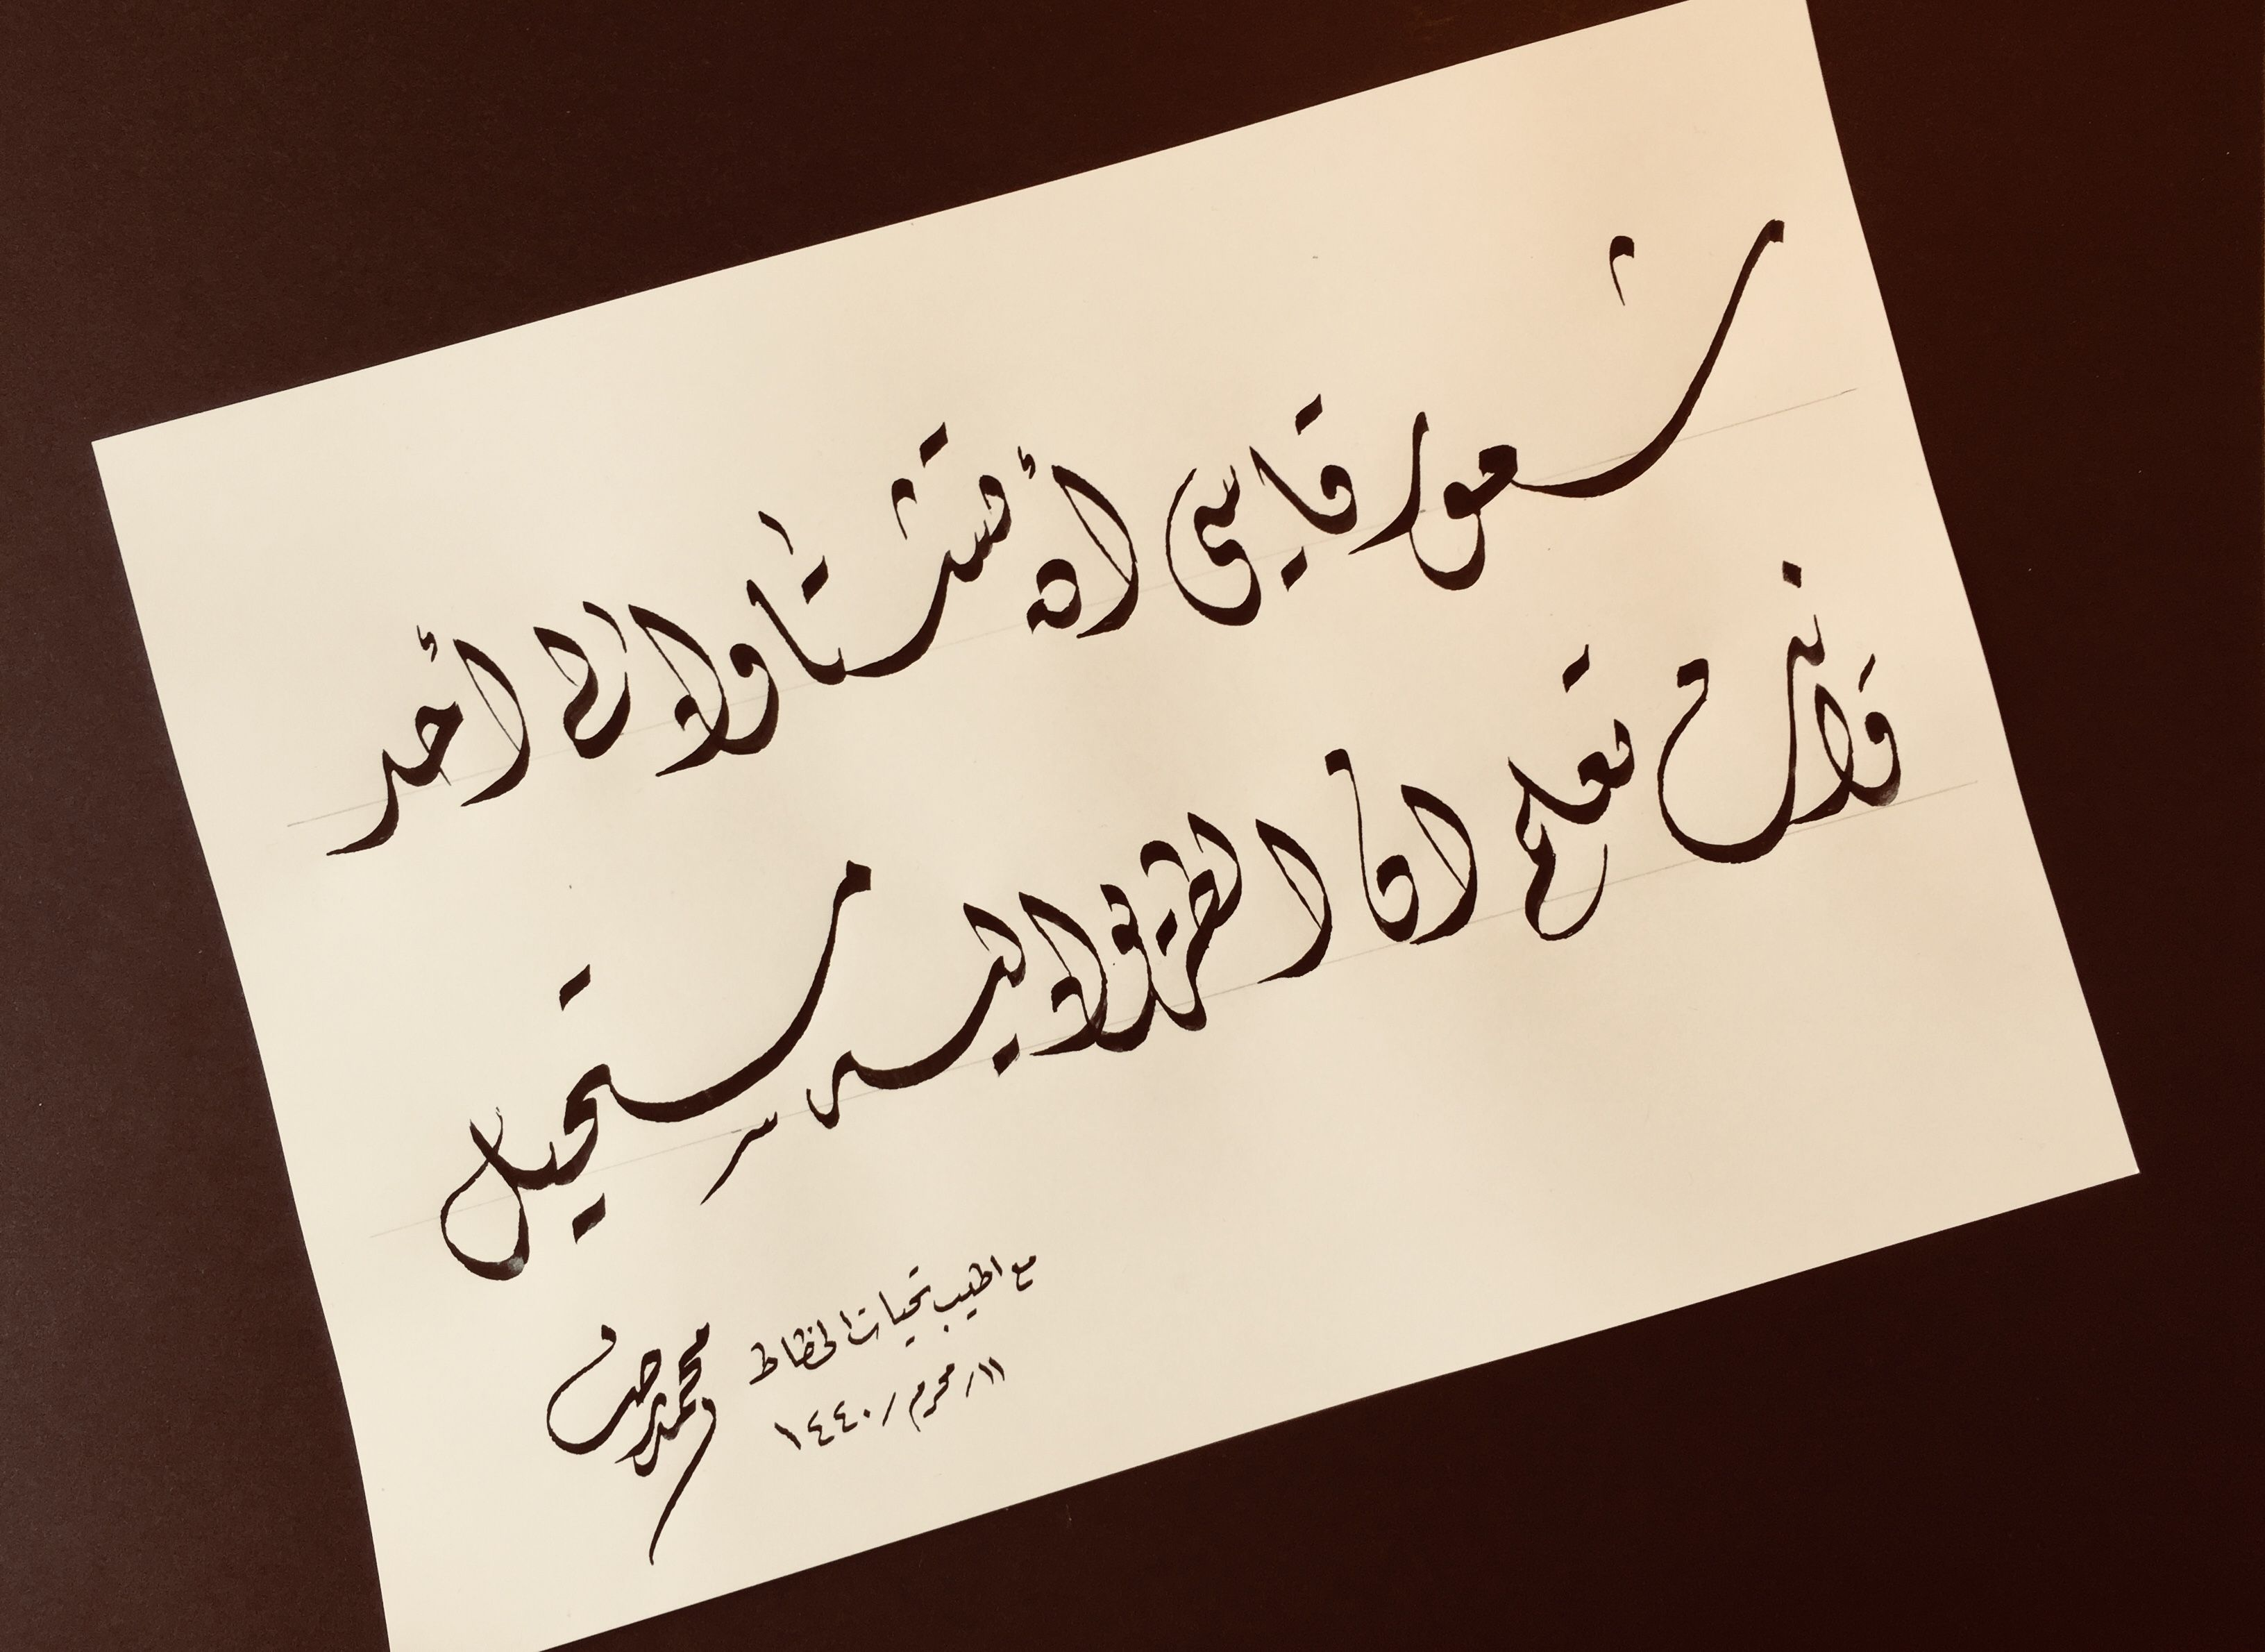 Pin by Mohammad on لوحة للخطاط محمدرضا Calligraphy